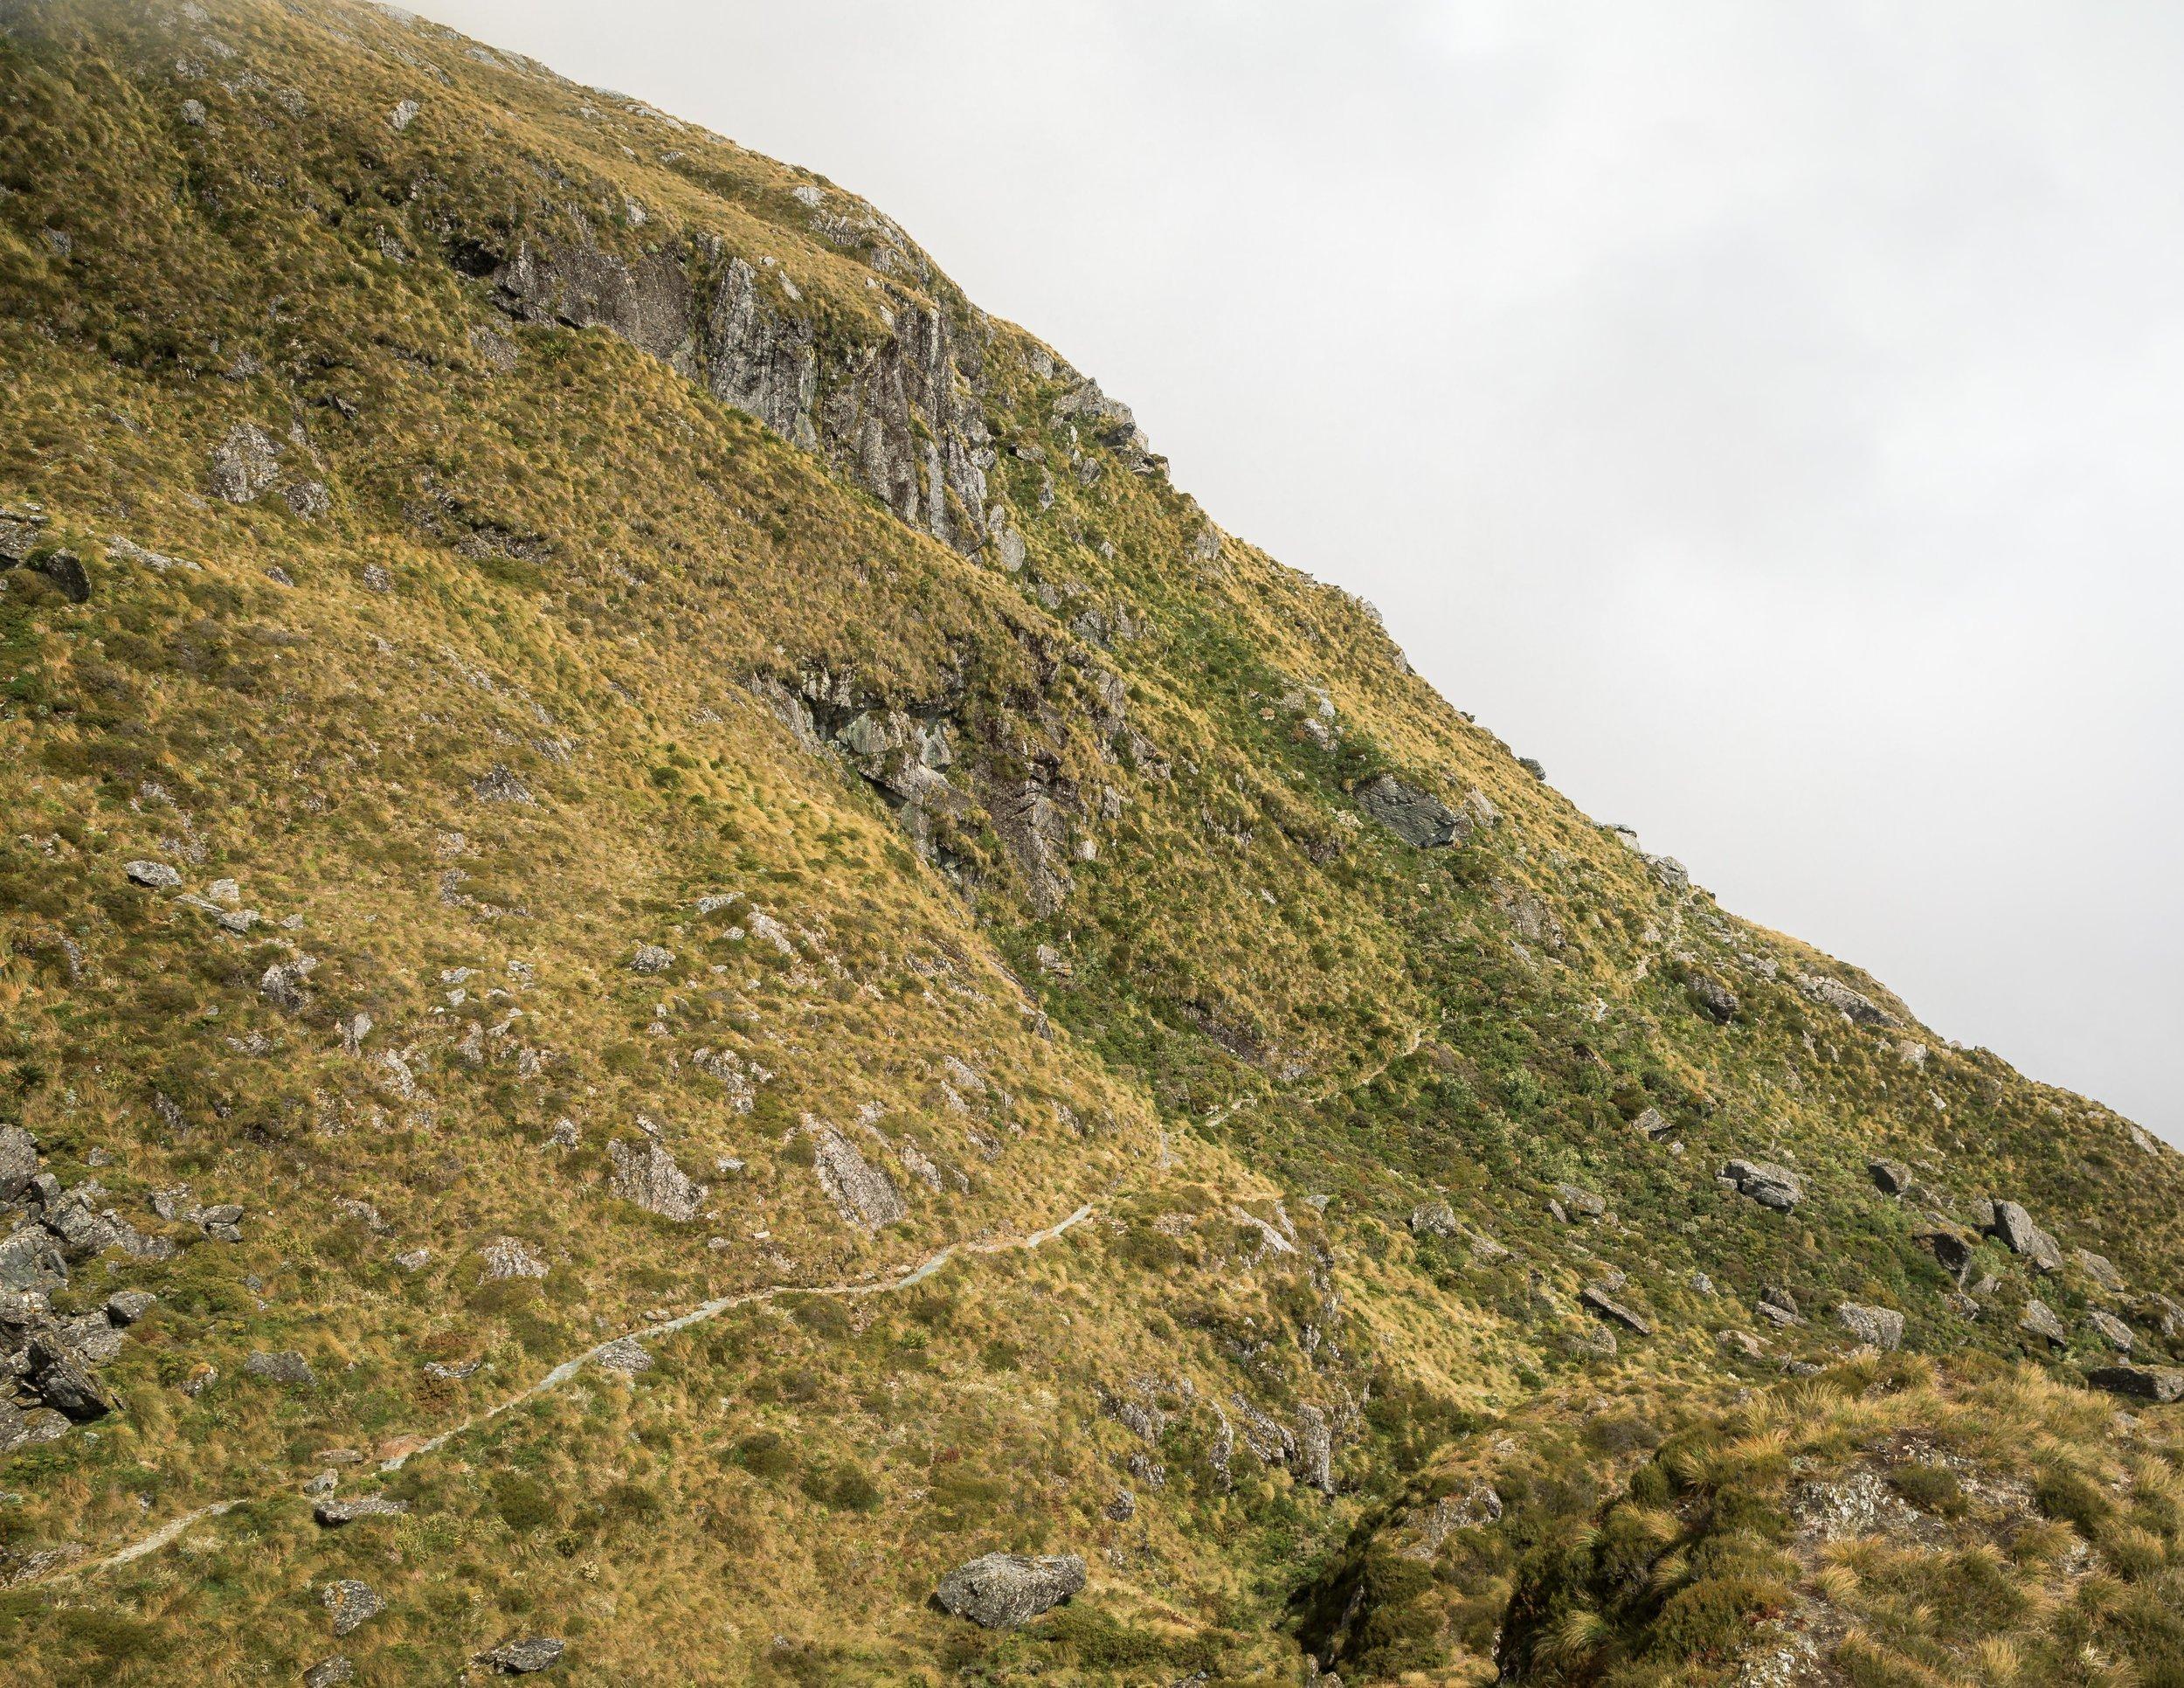 The Routeburn Track: Harris Saddle to Lake MacKenzie